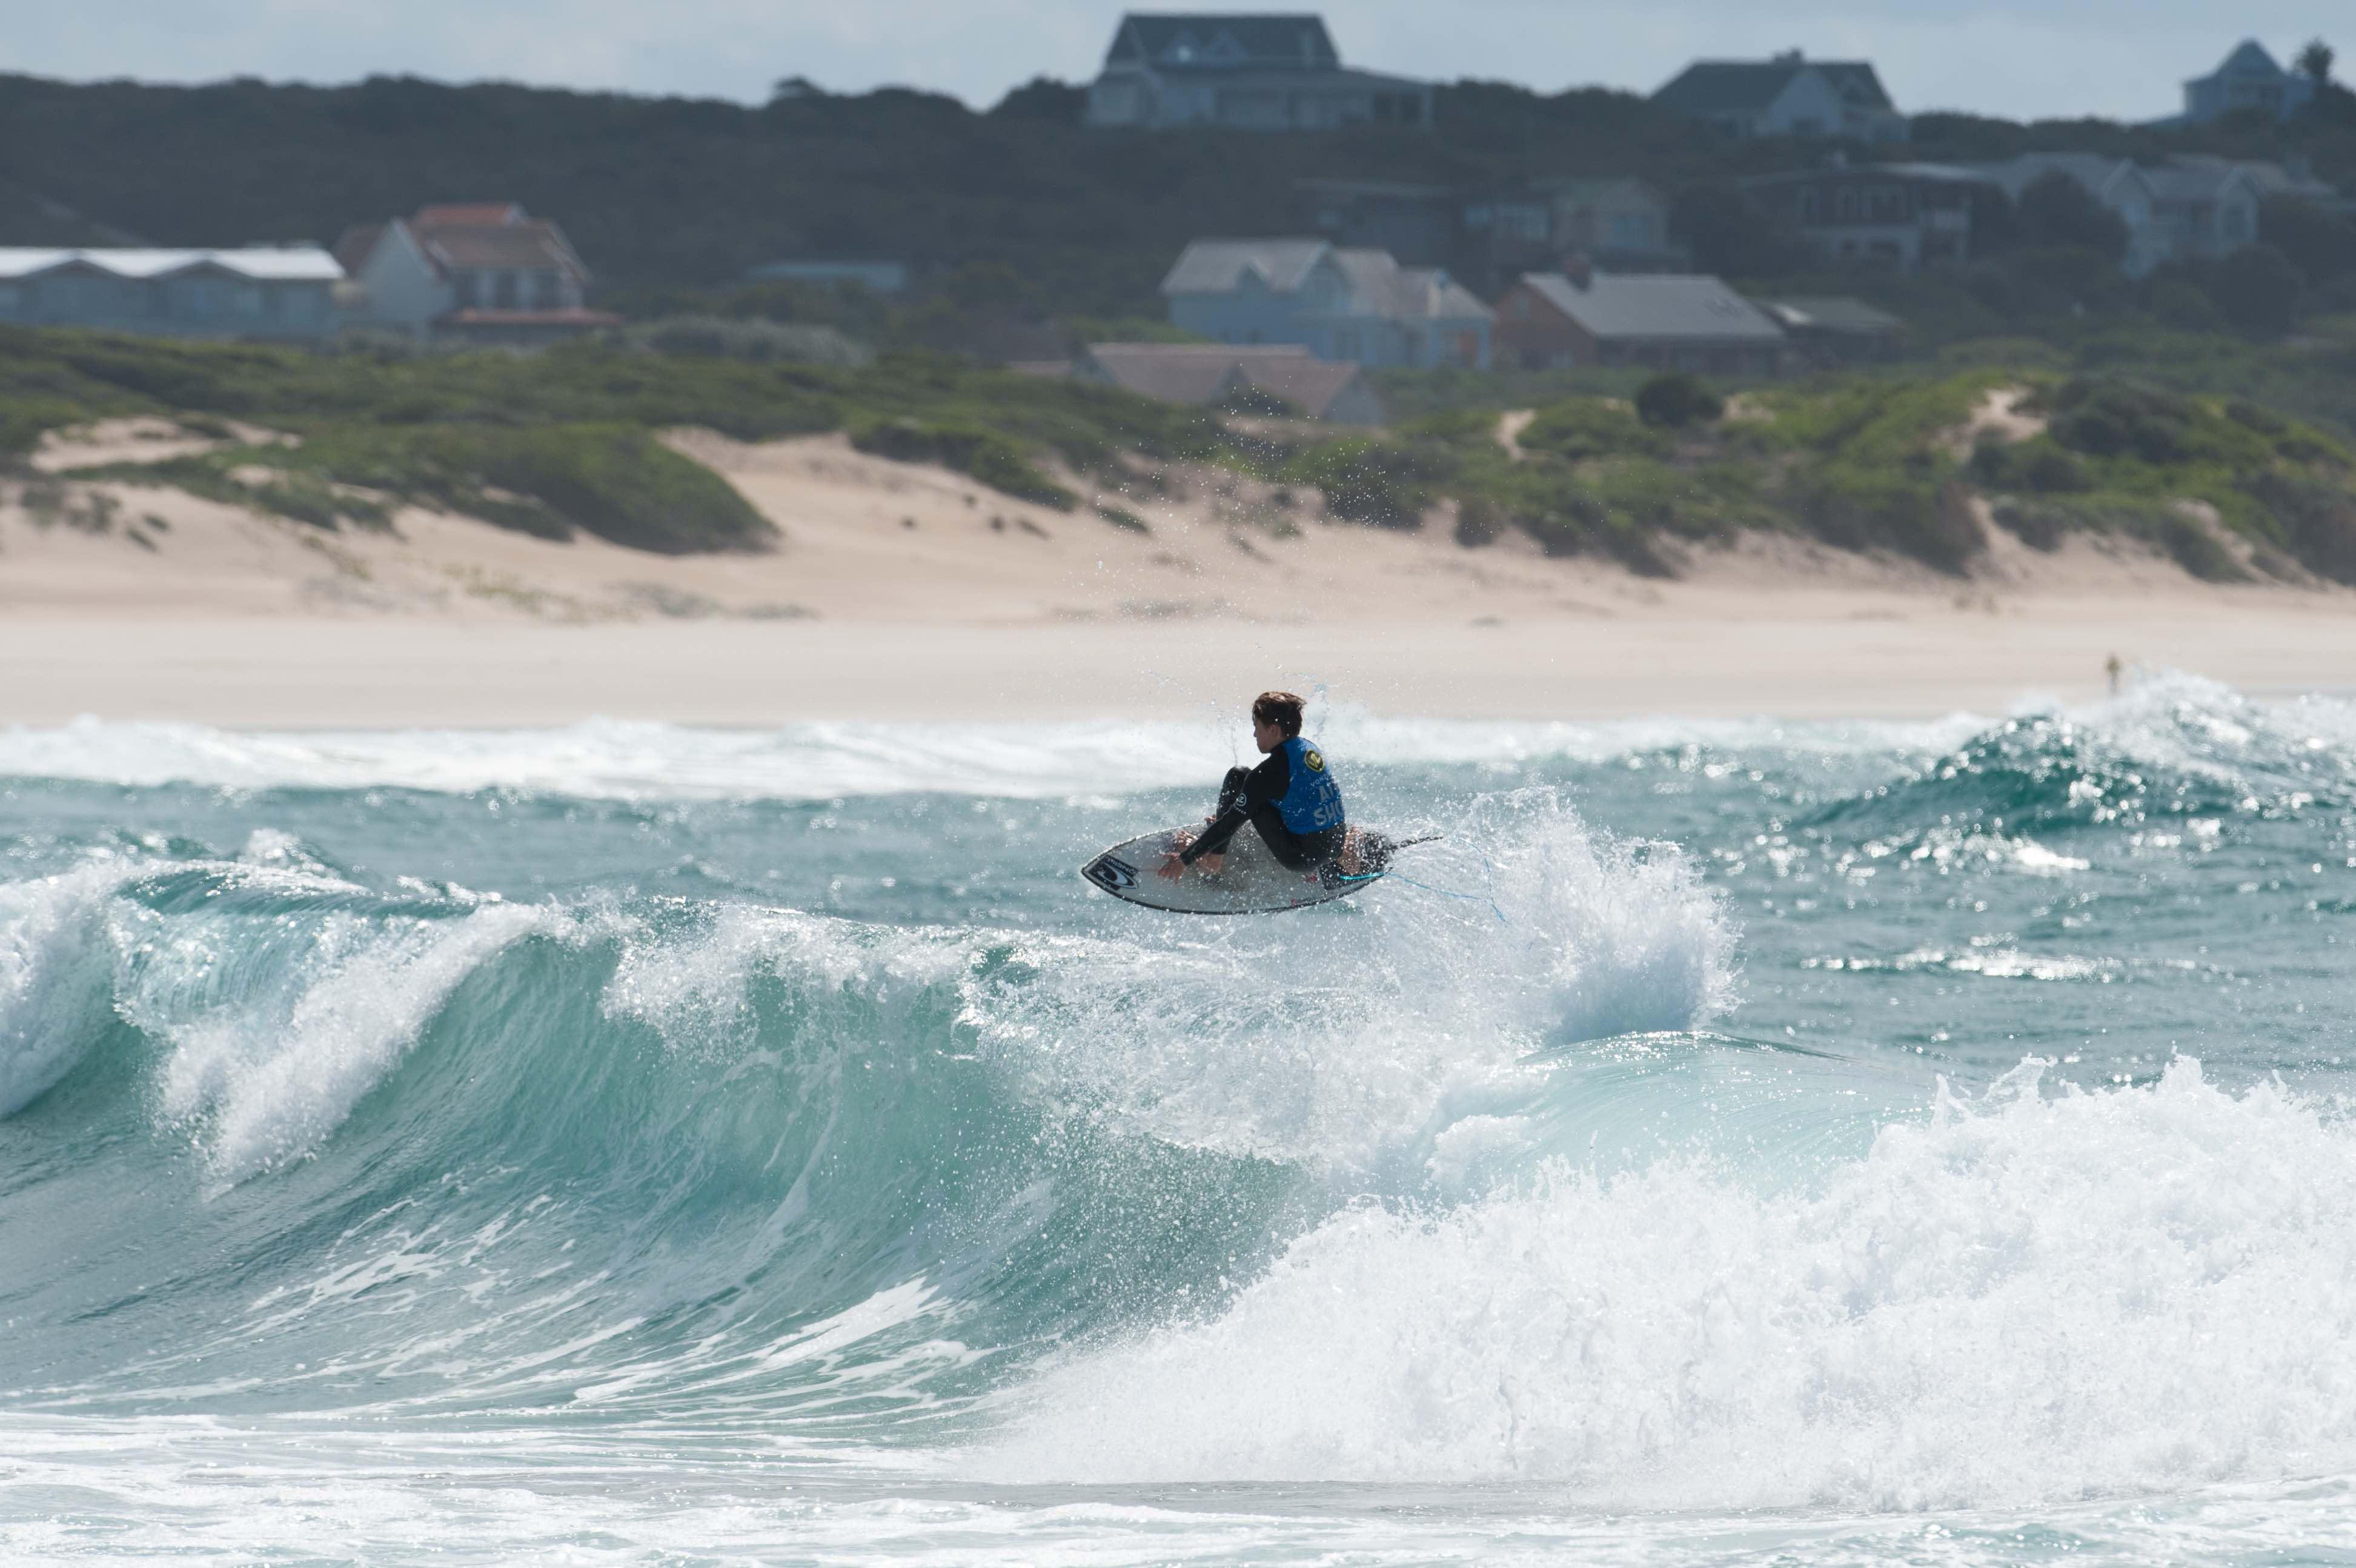 Eli Beukes surfing in the Billabong Junior Series